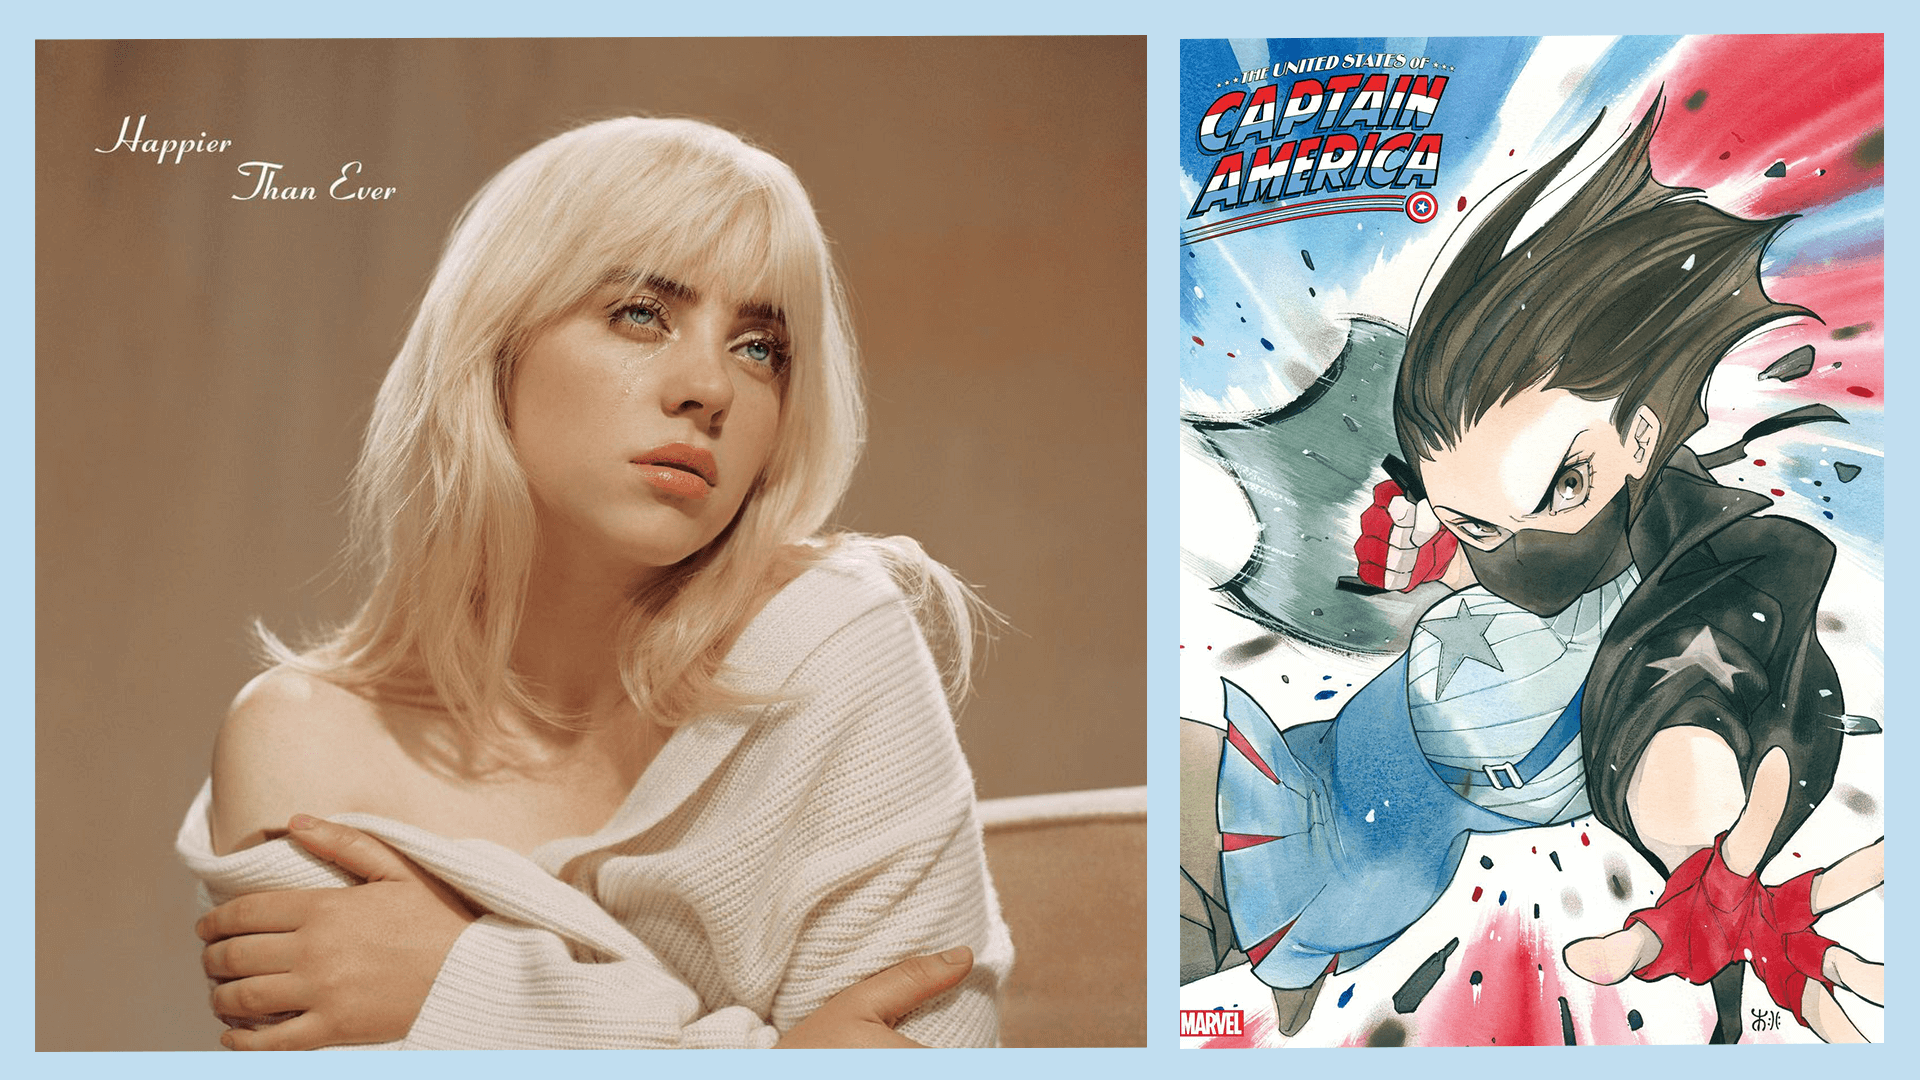 Trending News Roundup: Marvel Comics' Ari Agbayani, IU and Park Seo Joon's 'Dream,' Billie Eilish's 'Lost Cause'